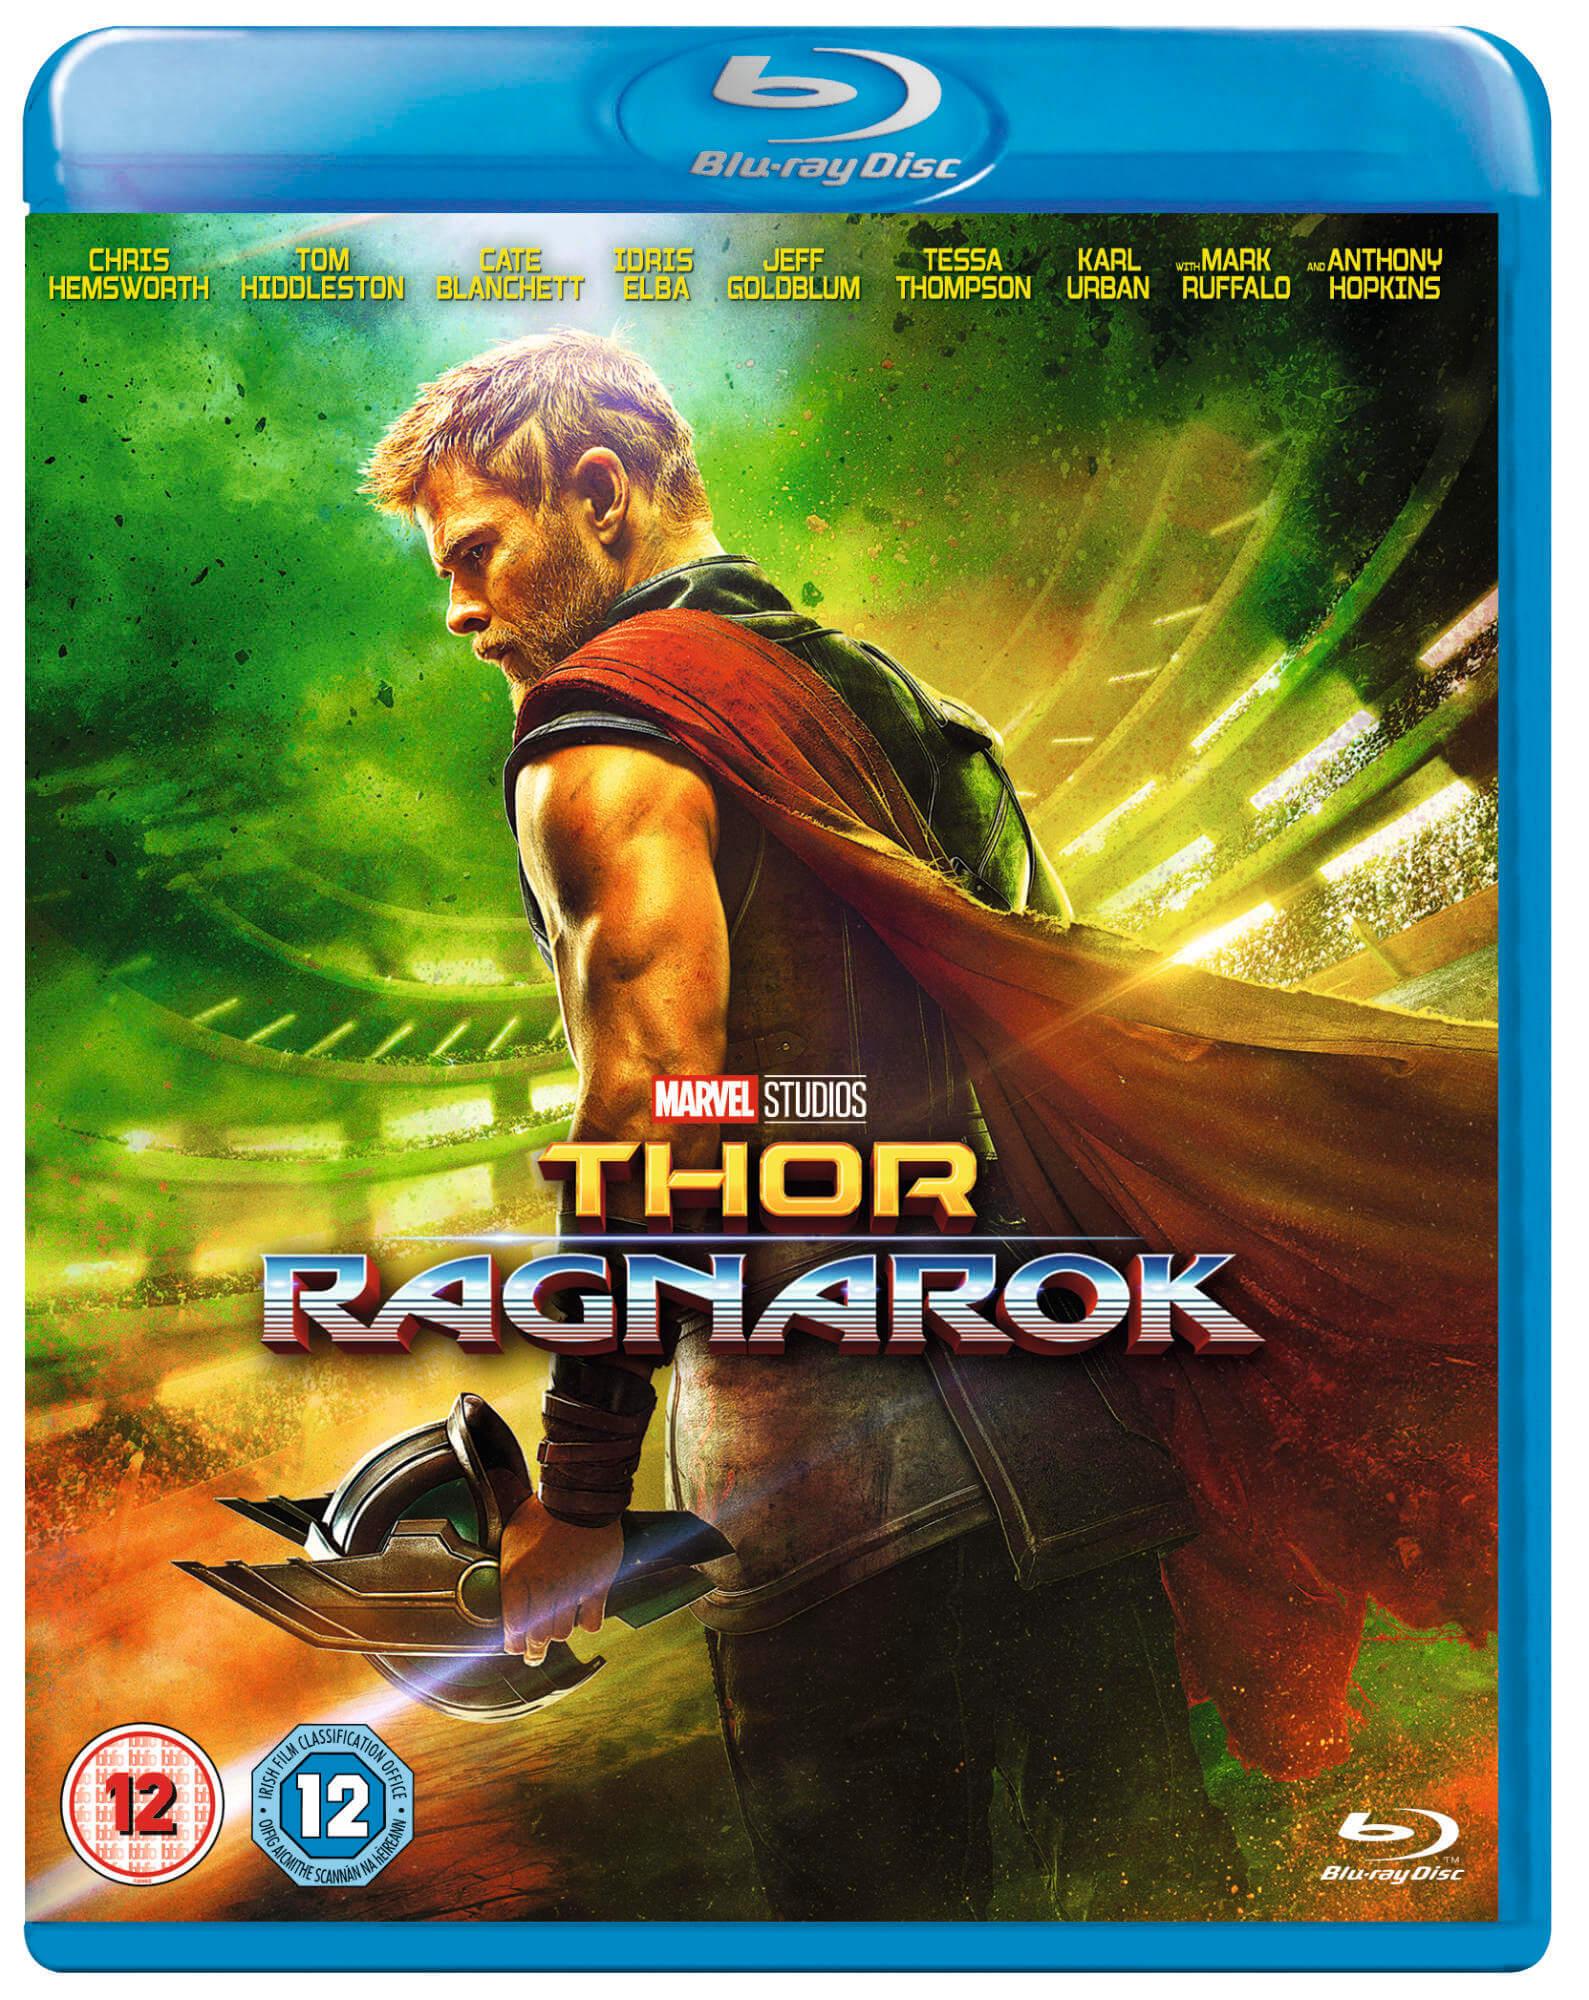 Thor Ragnarok Blu Ray Download : ragnarok, download, ENDED], THOR:, RAGNAROK, Blu-ray, STARBURST, Magazine